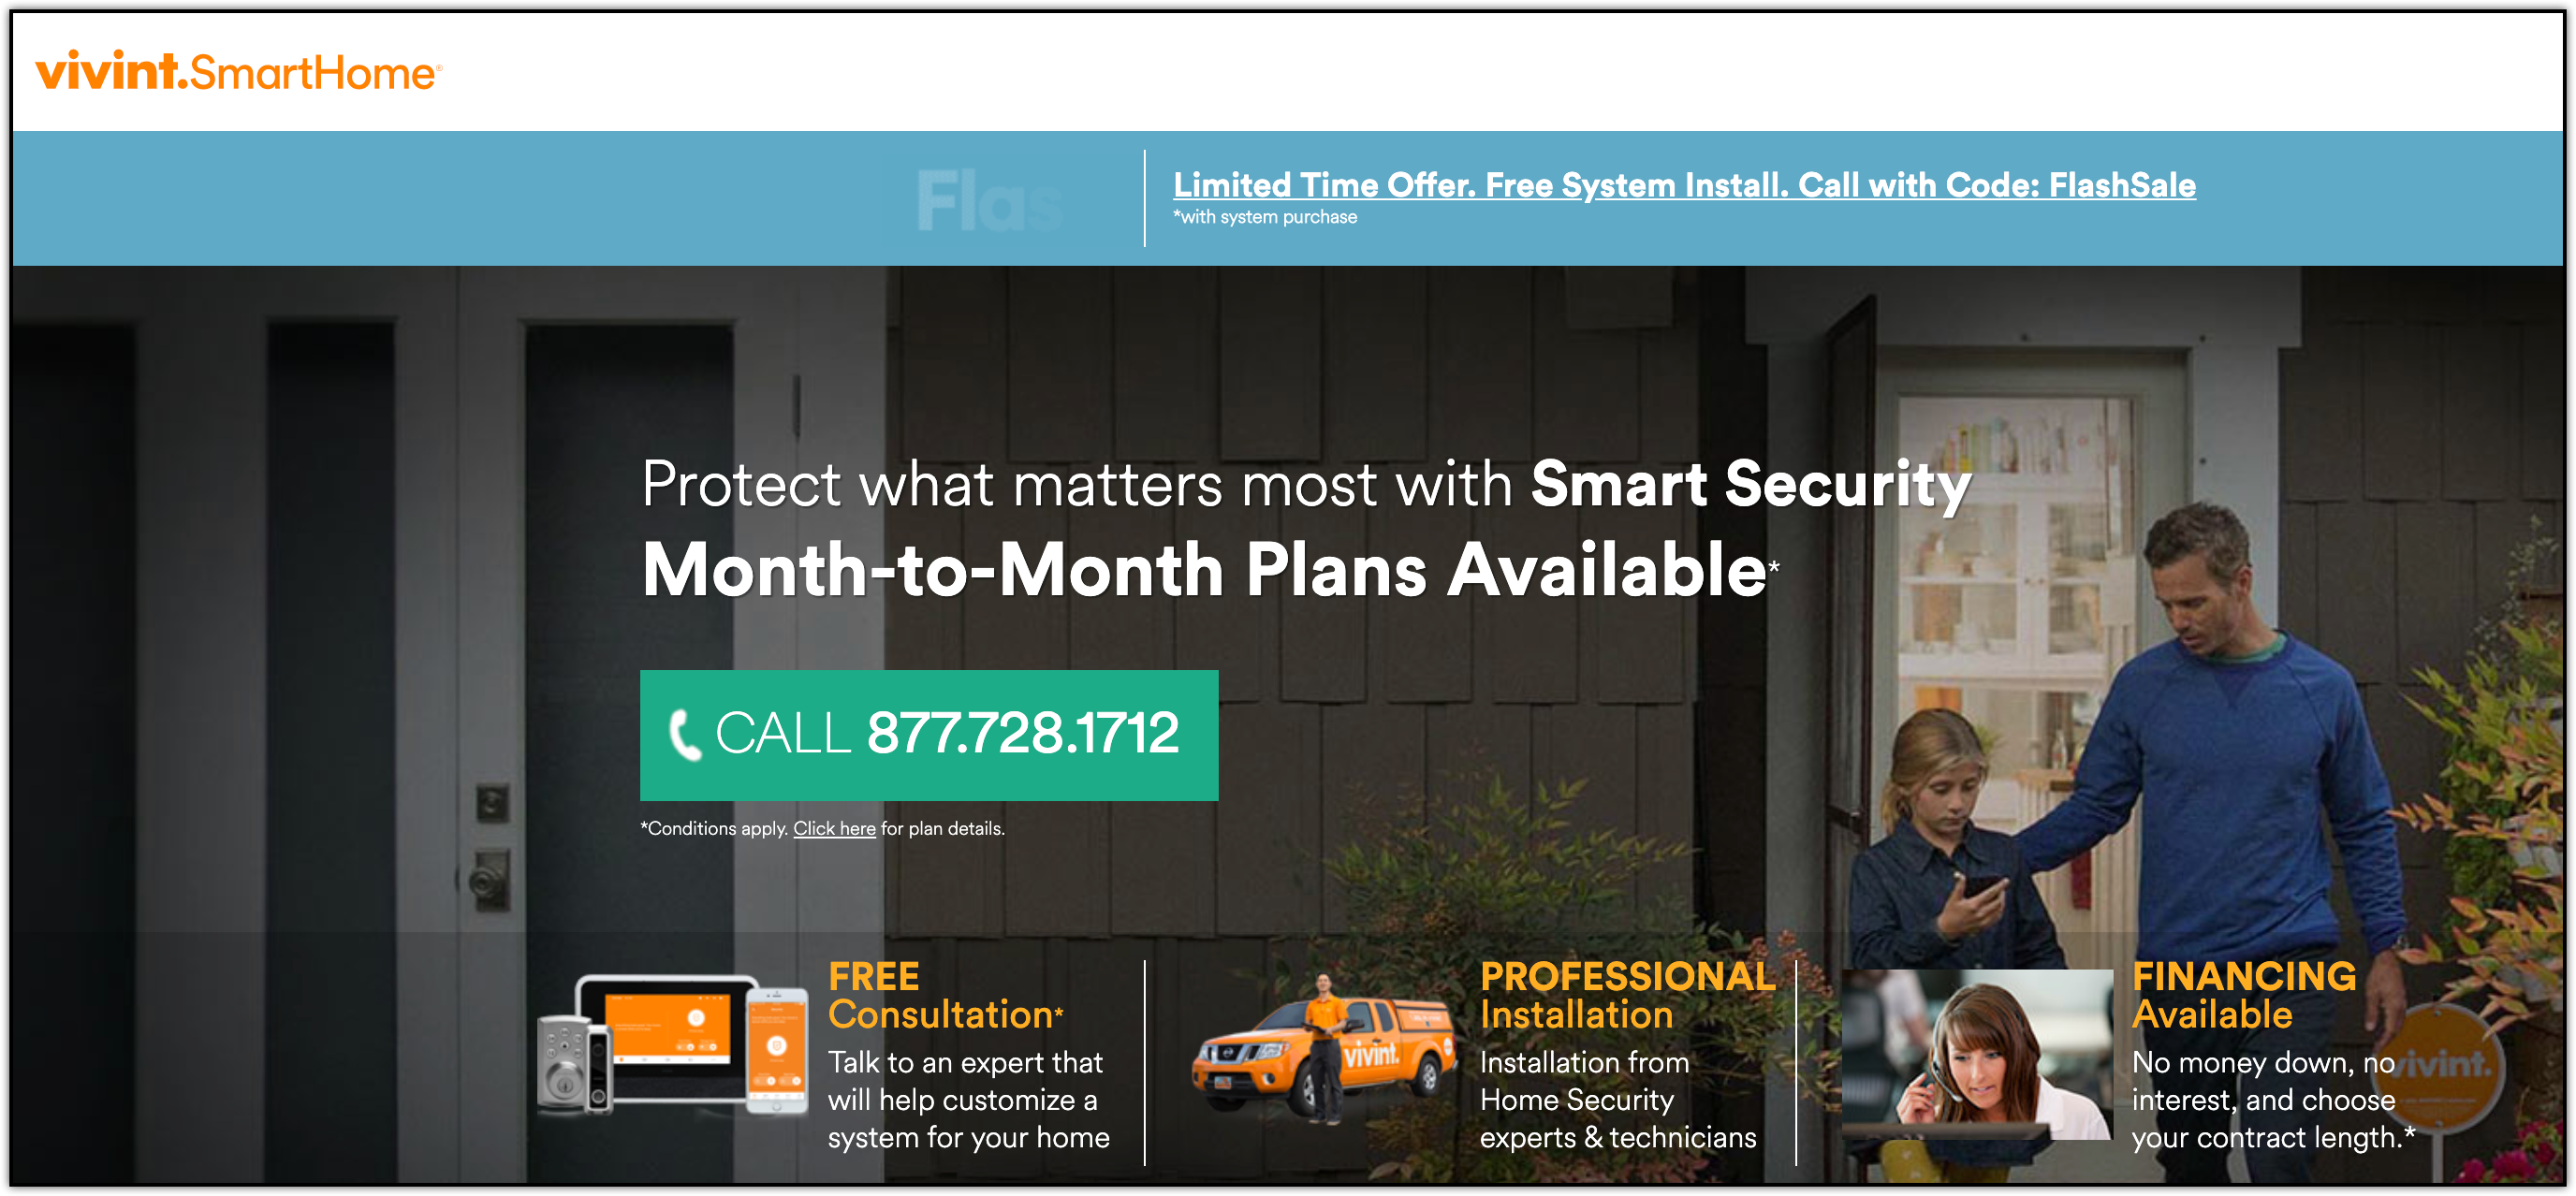 vivint smart home homepage